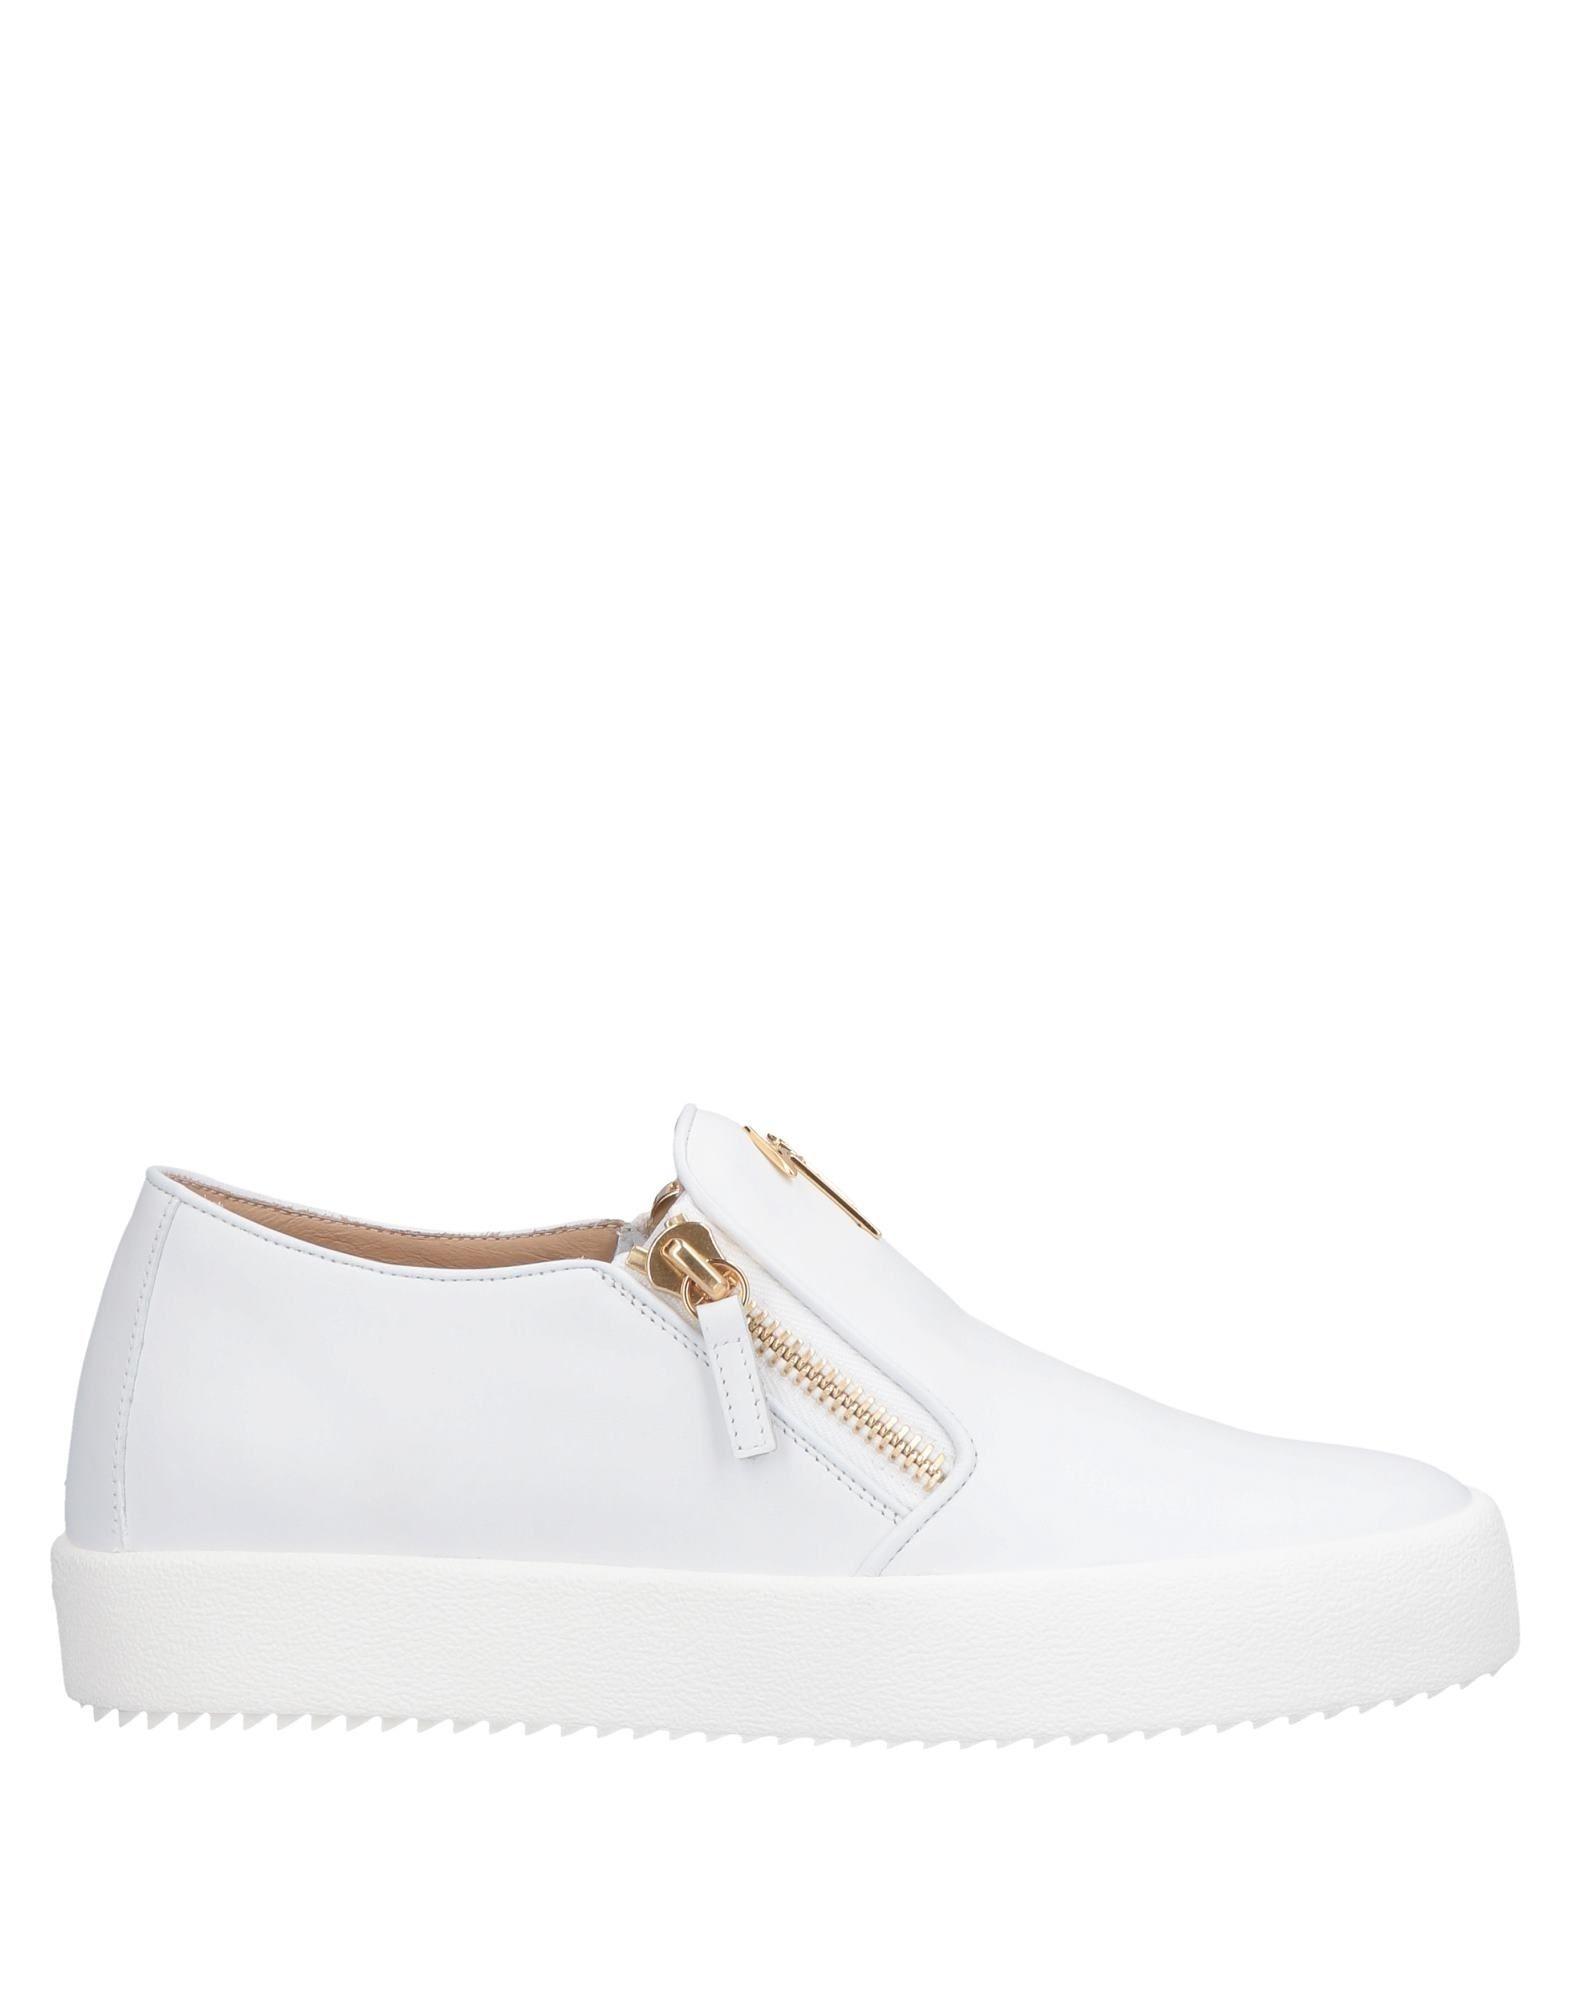 Giuseppe Zanotti Leathers Sneakers